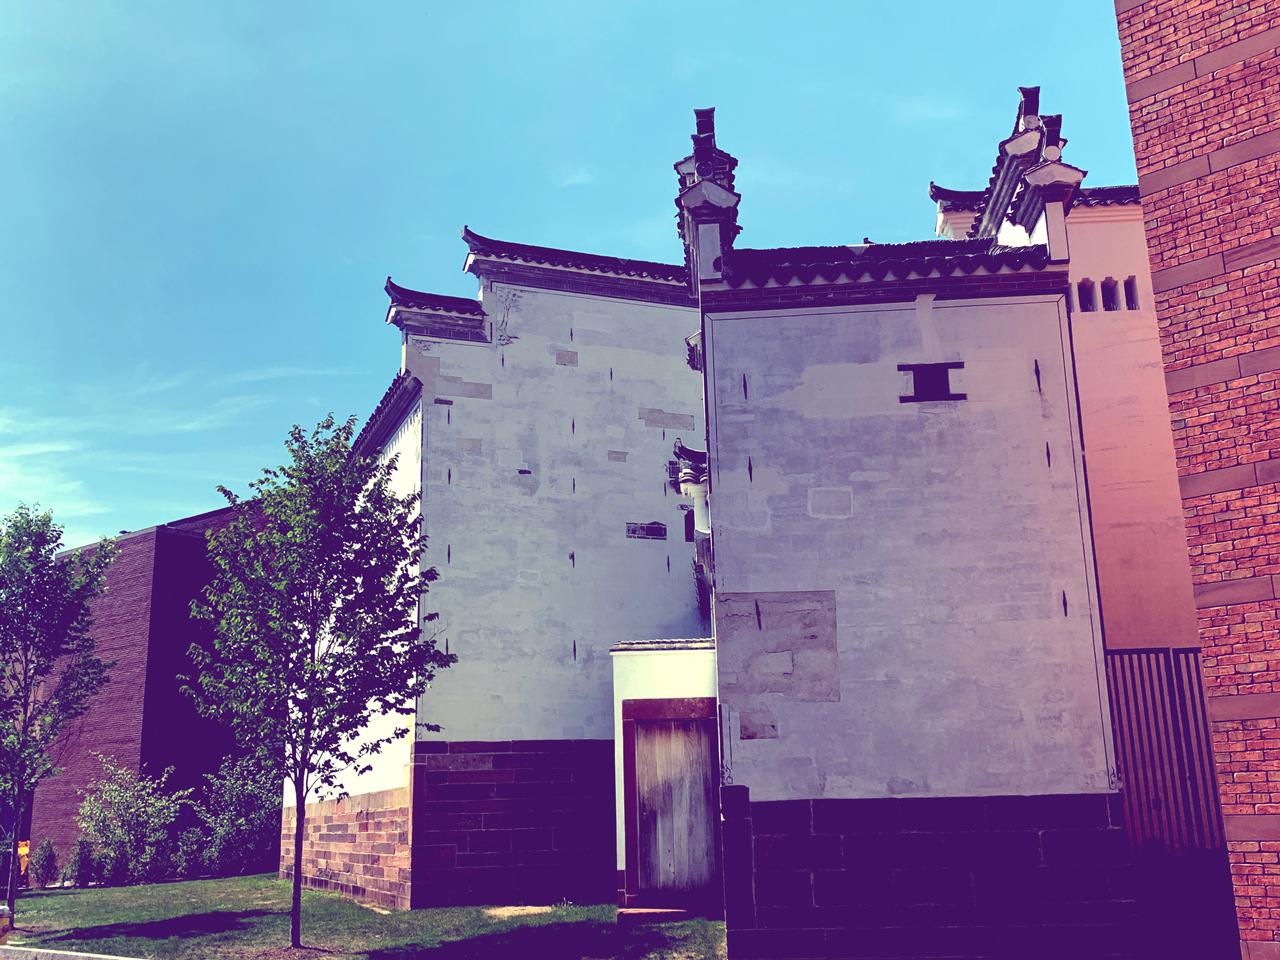 yin-yu-tang-house-peabody-essex-museum-salem-massachusetts-1280x960-04